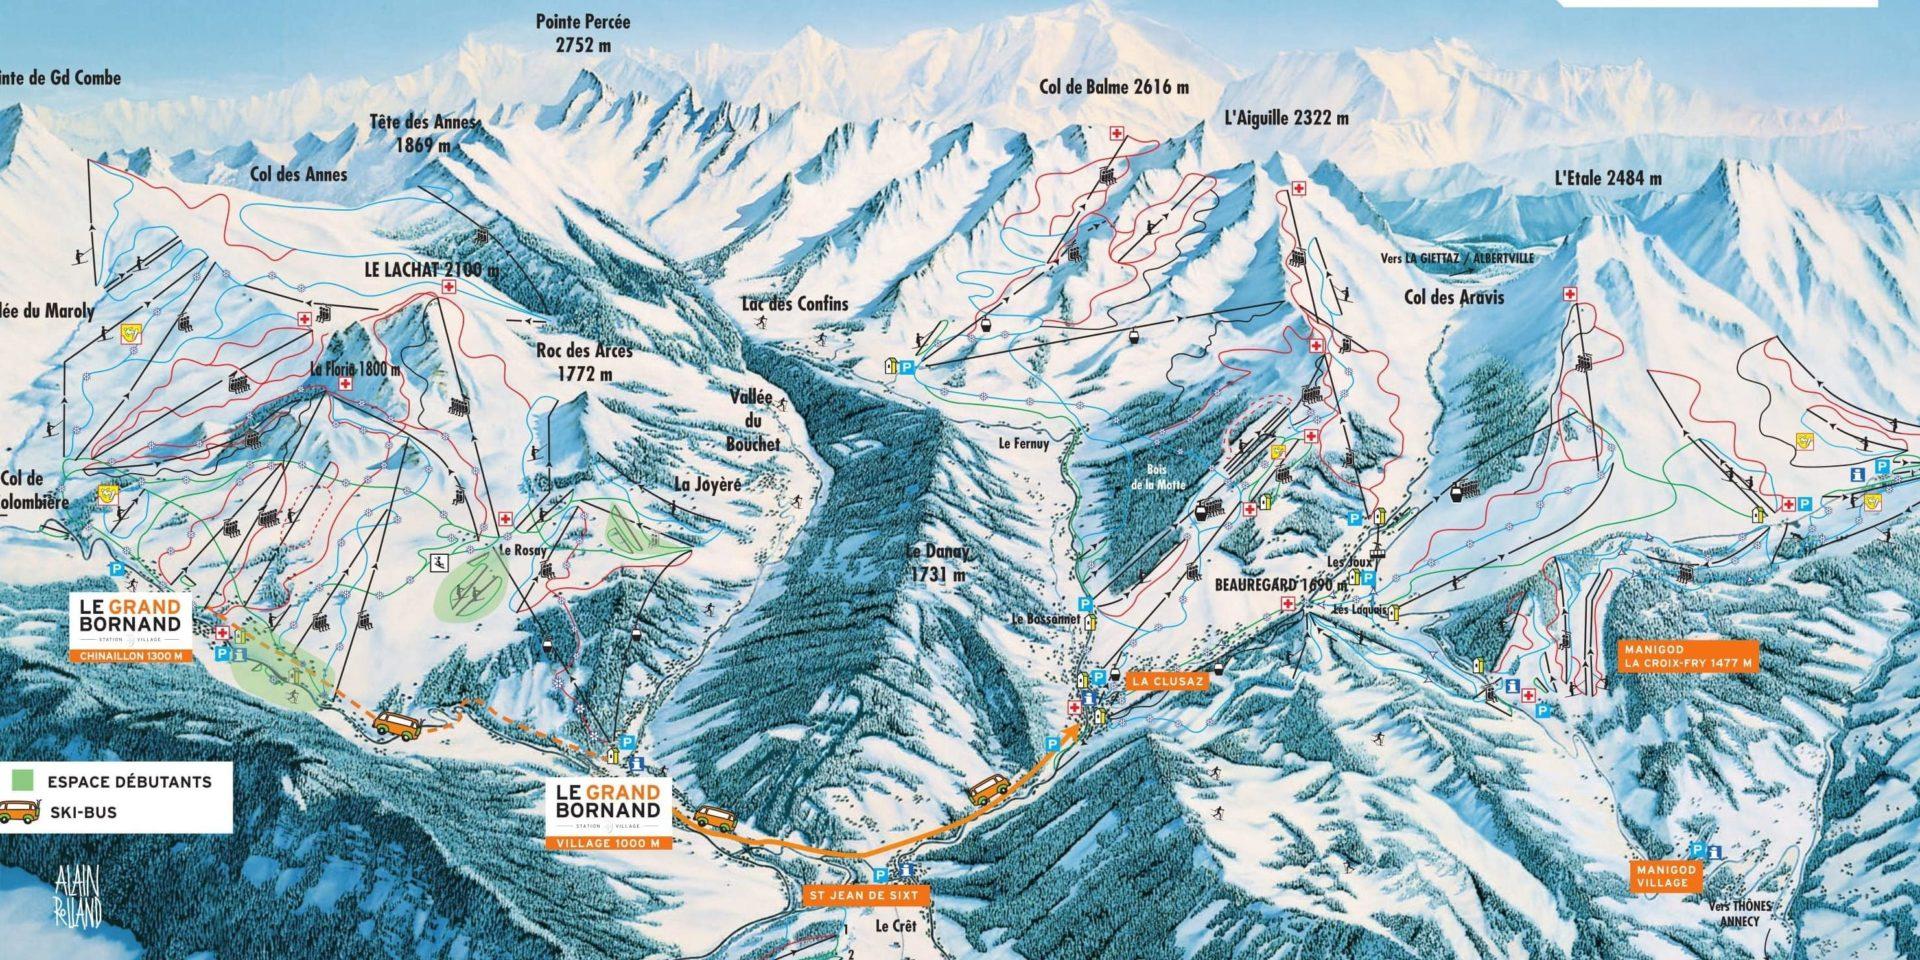 Pisteplattegrond Aravis Le Grand Bornand La Clusaz Manigod St Jean de Sixt Frankrijk plattegrond kaart skigebied wintersport skivakantie luxe